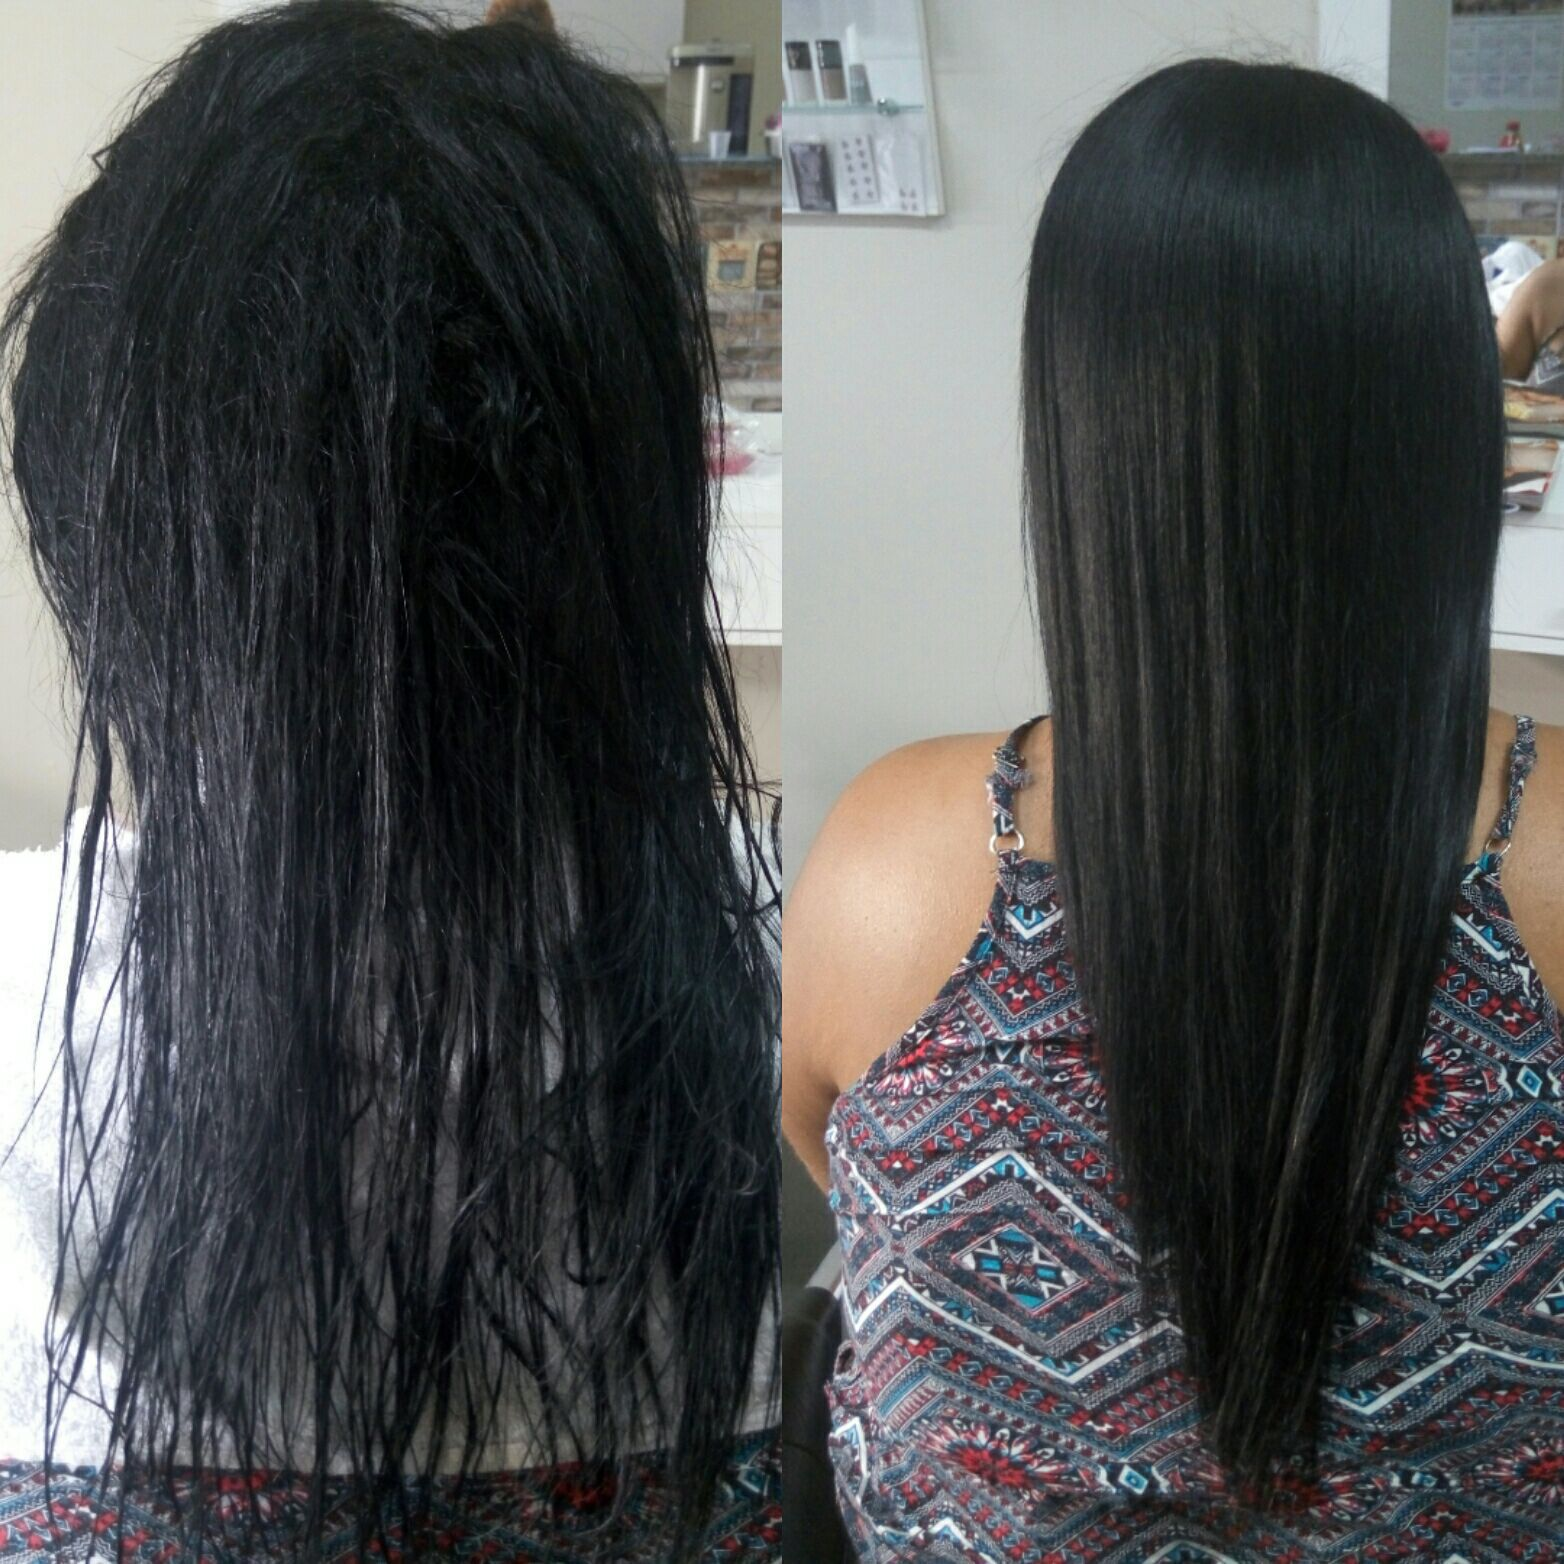 Escova Progressiva ZAP cabelo auxiliar cabeleireiro(a) cabeleireiro(a) auxiliar cabeleireiro(a)